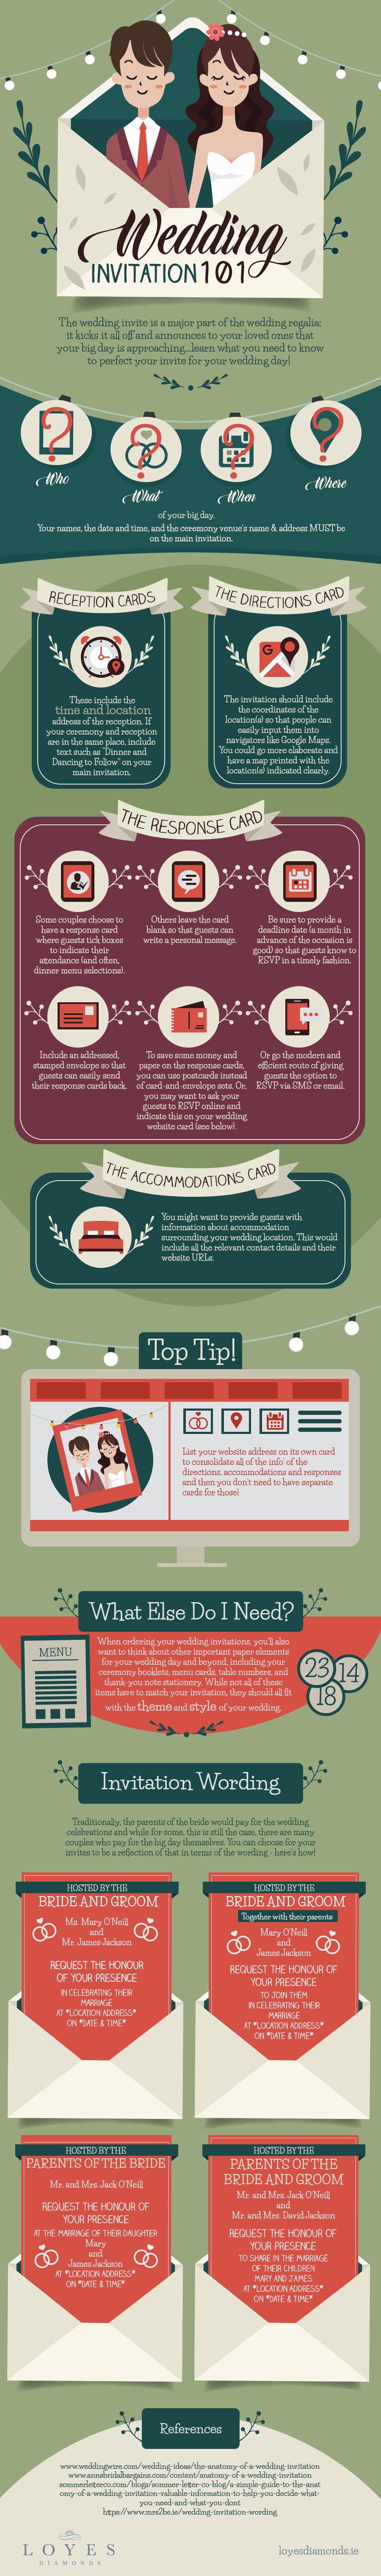 Wedding Invitation 101 Infographic